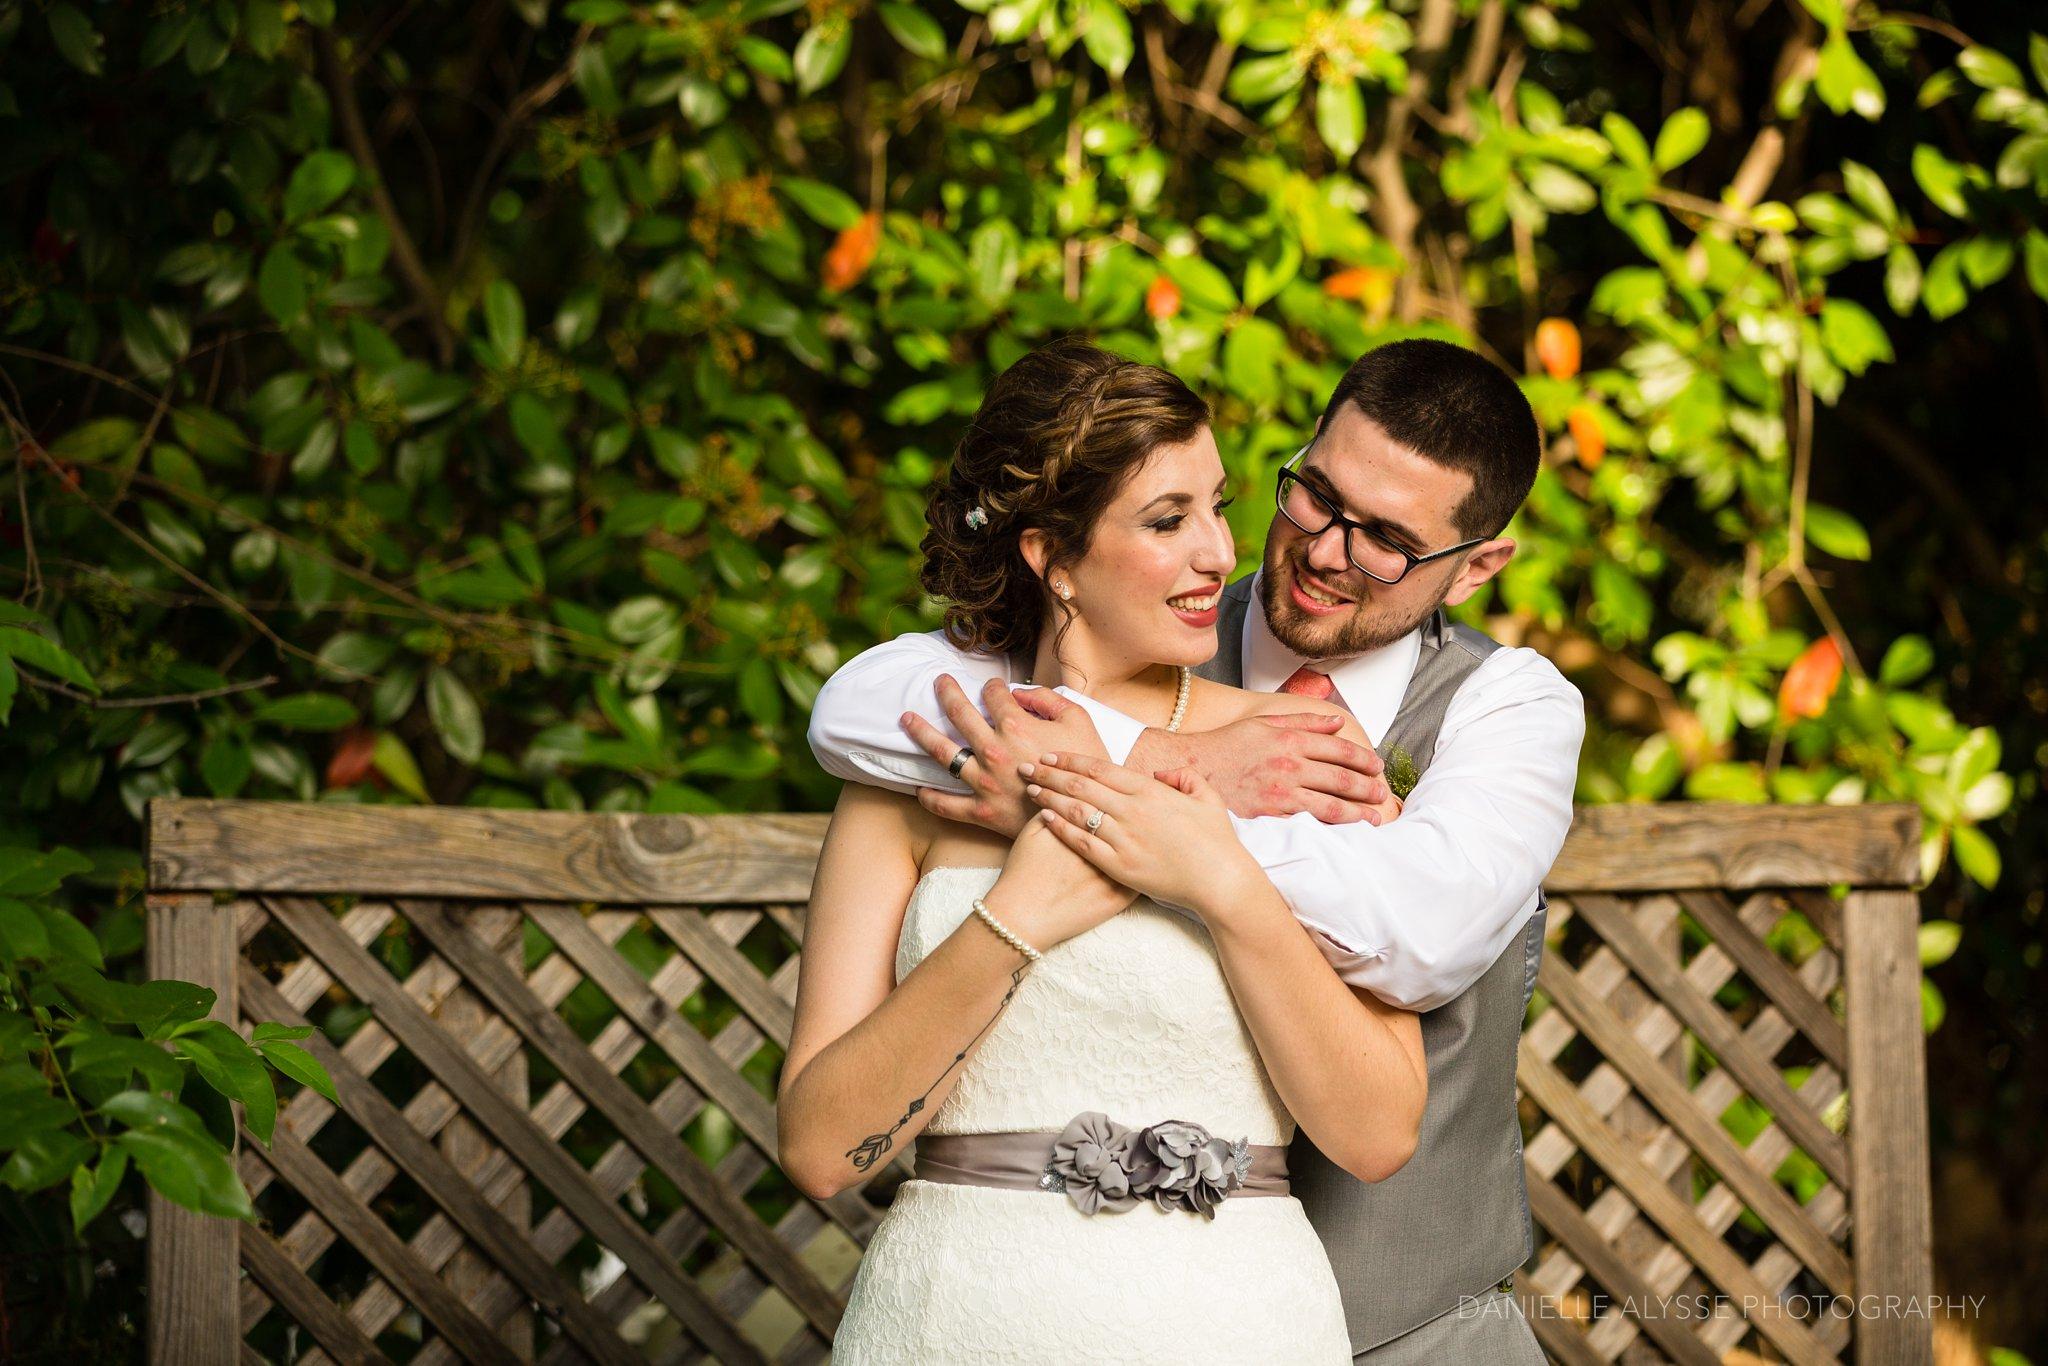 170507_blog_megan_david_wedding_loomis_flower_farm_inn_danielle_alysse_photography_sacramento_photographer0407_WEB.jpg